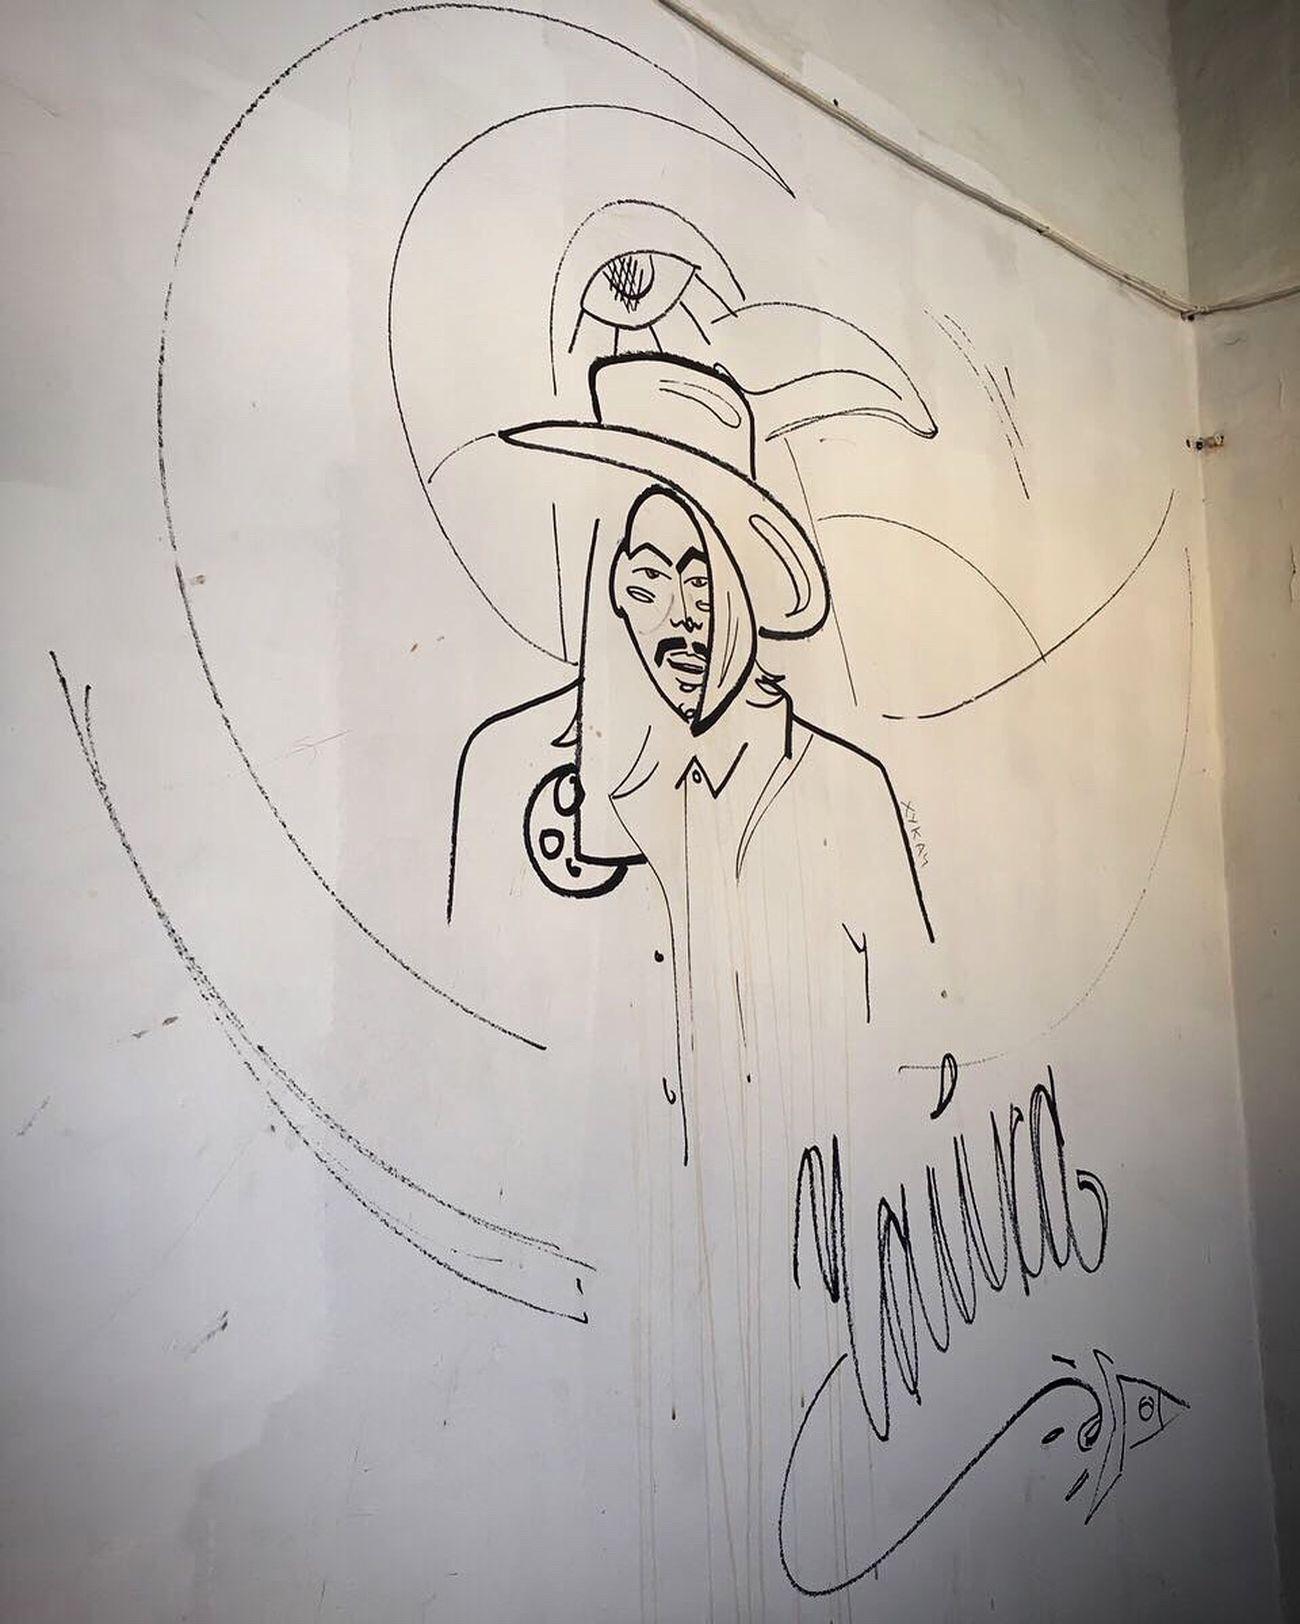 Low Angle View Sketch Creativity Drawing - Art Product Drawing Drawing - Activity High Angle View Streetphotography Grafitti